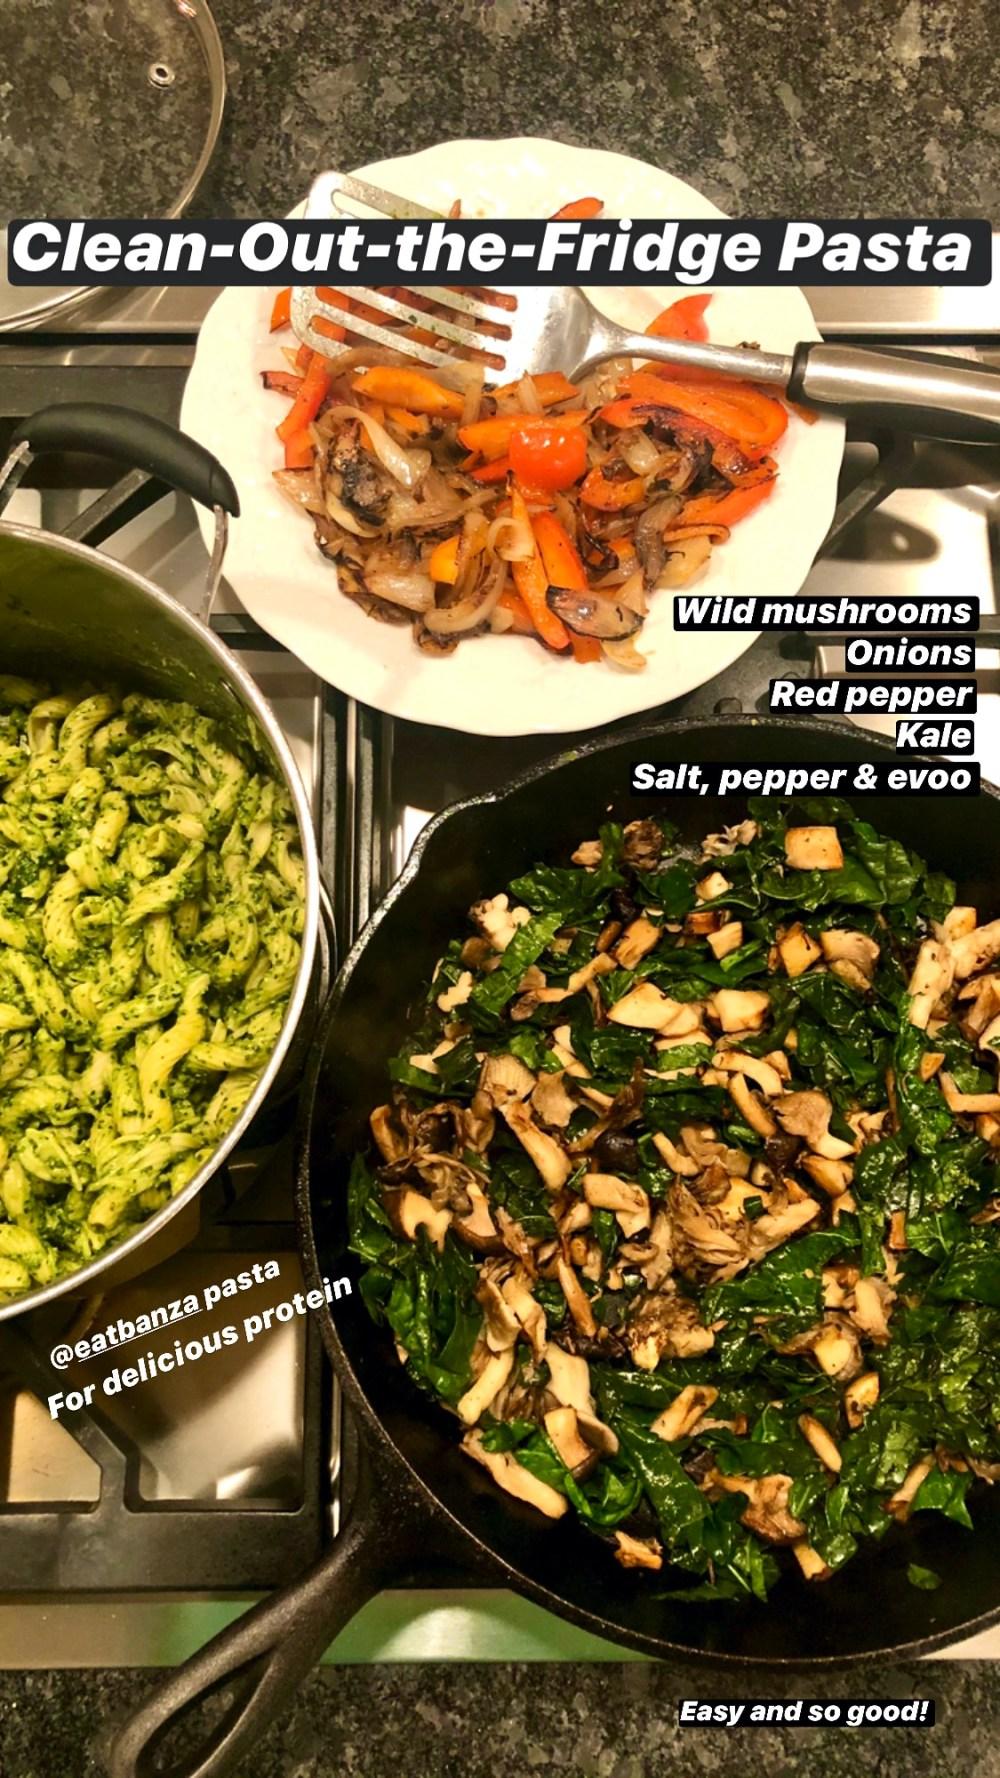 Kale Pesto turns simple, healthy ingredients into a super satisfying weeknight meal.